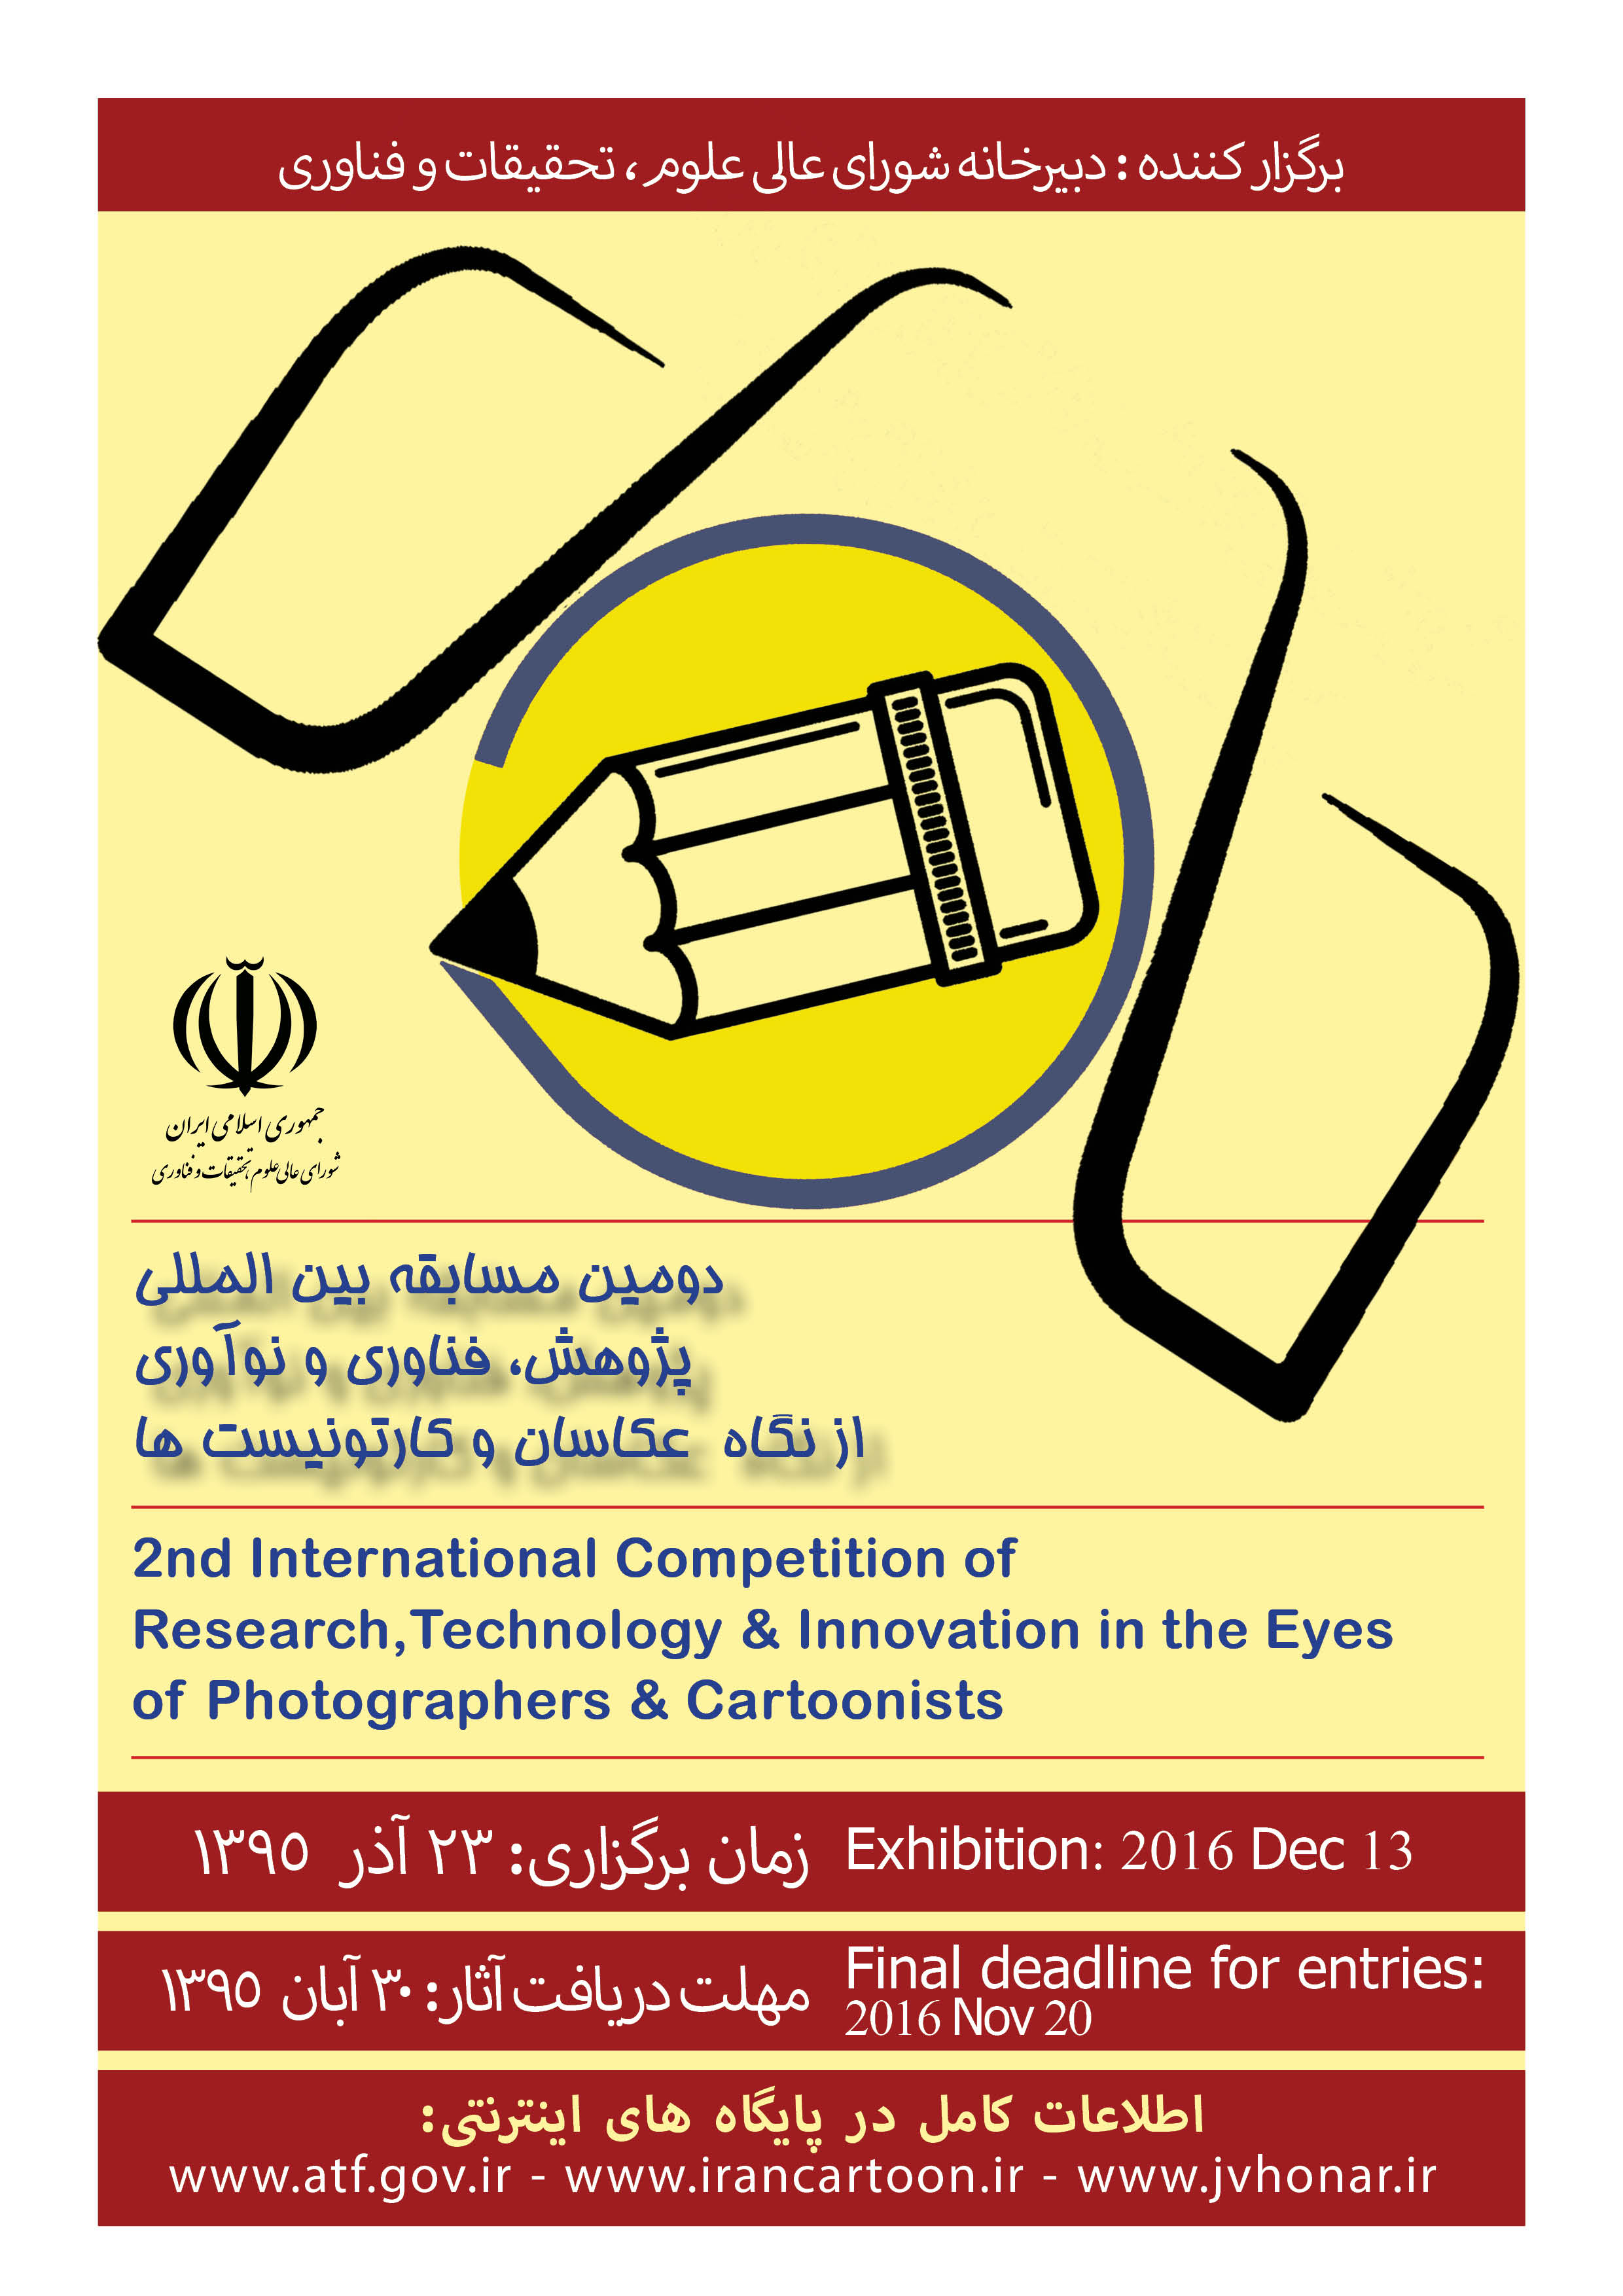 "دومین مسابقه بین المللی "" پژوهش، فناوری و نوآوری از نگاه عکاسان و کارتونیستها"